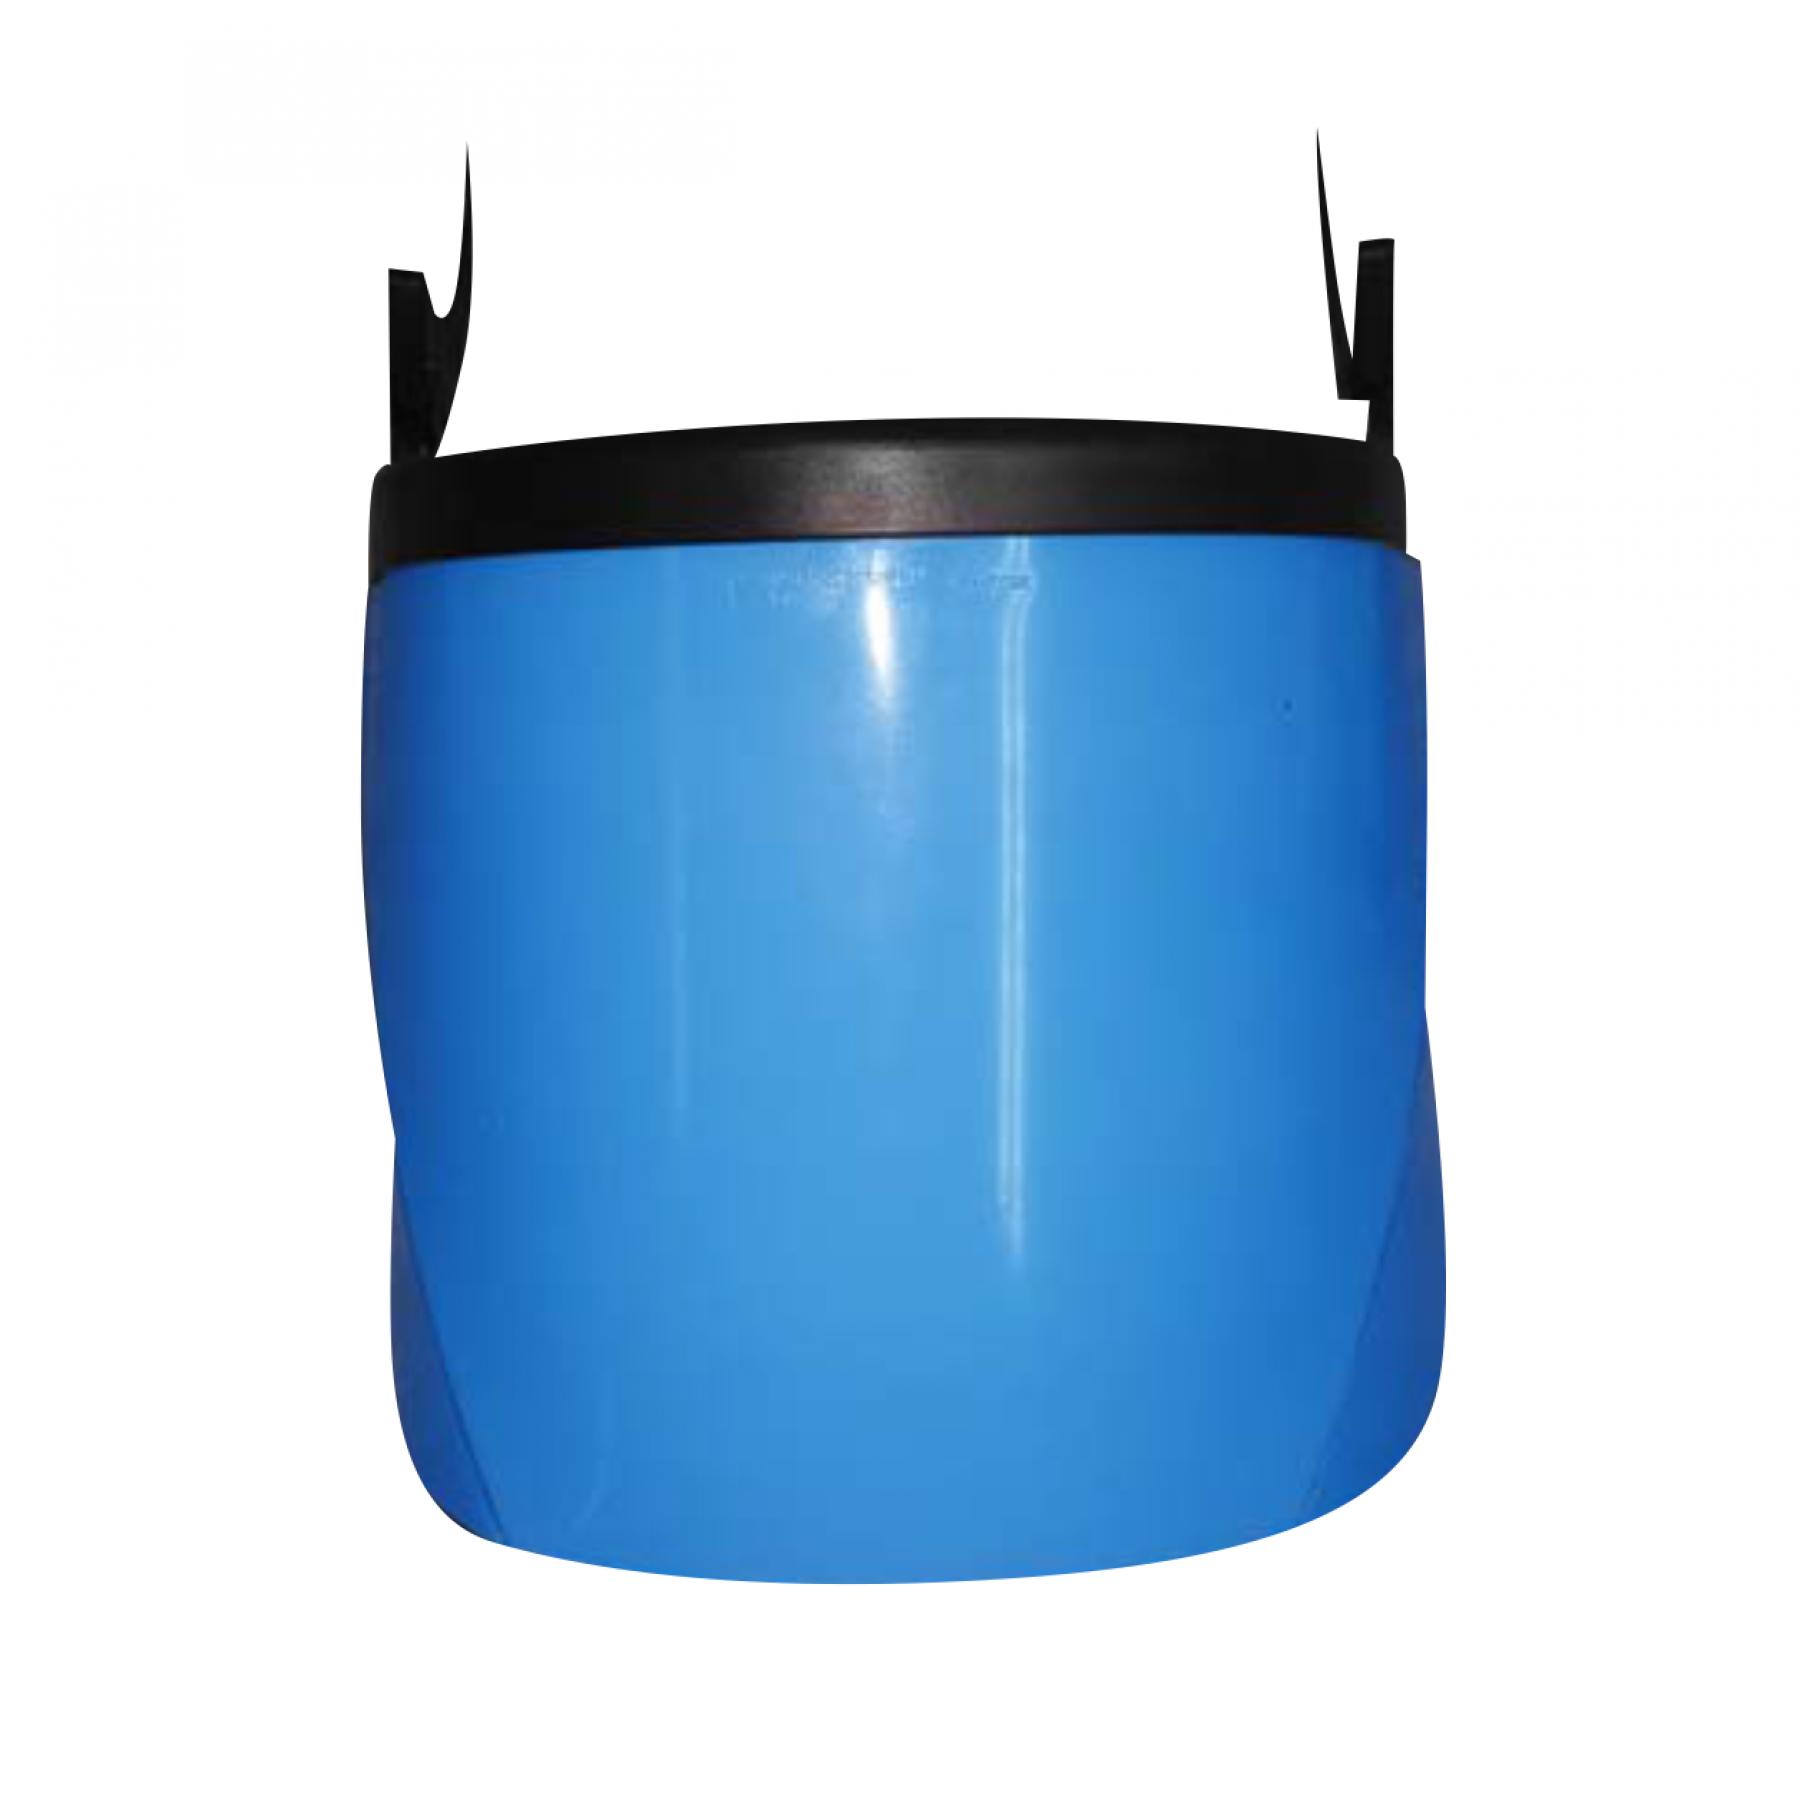 Dromex Evo Visor Carrier For Hard Hat With Inter-ex